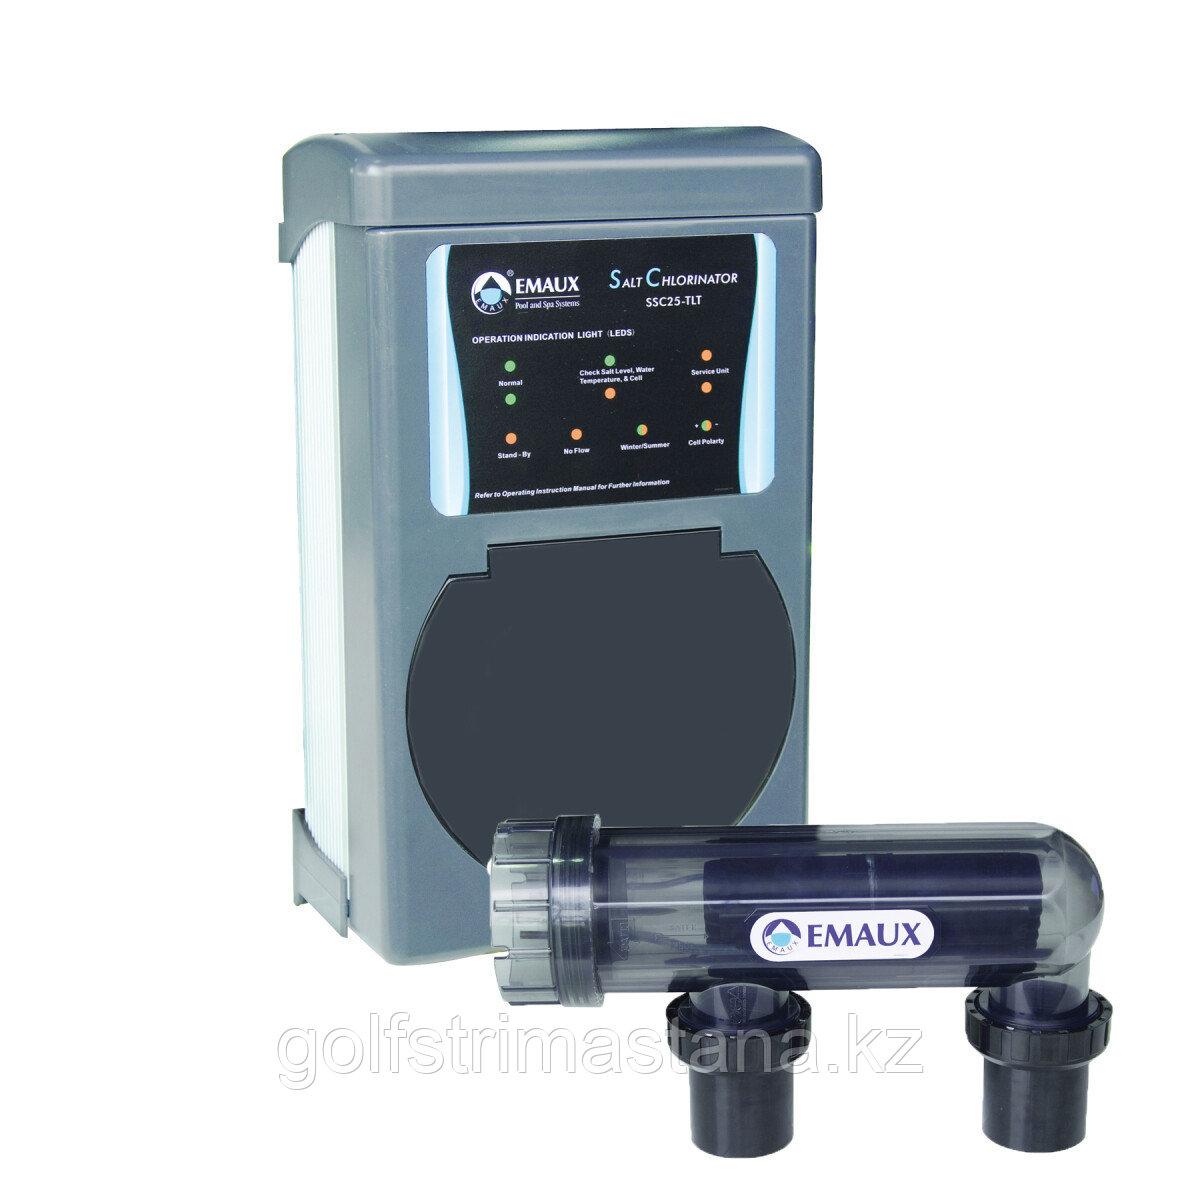 Хлоргенератор Aquaviva SSC25-E / 25 гр/час